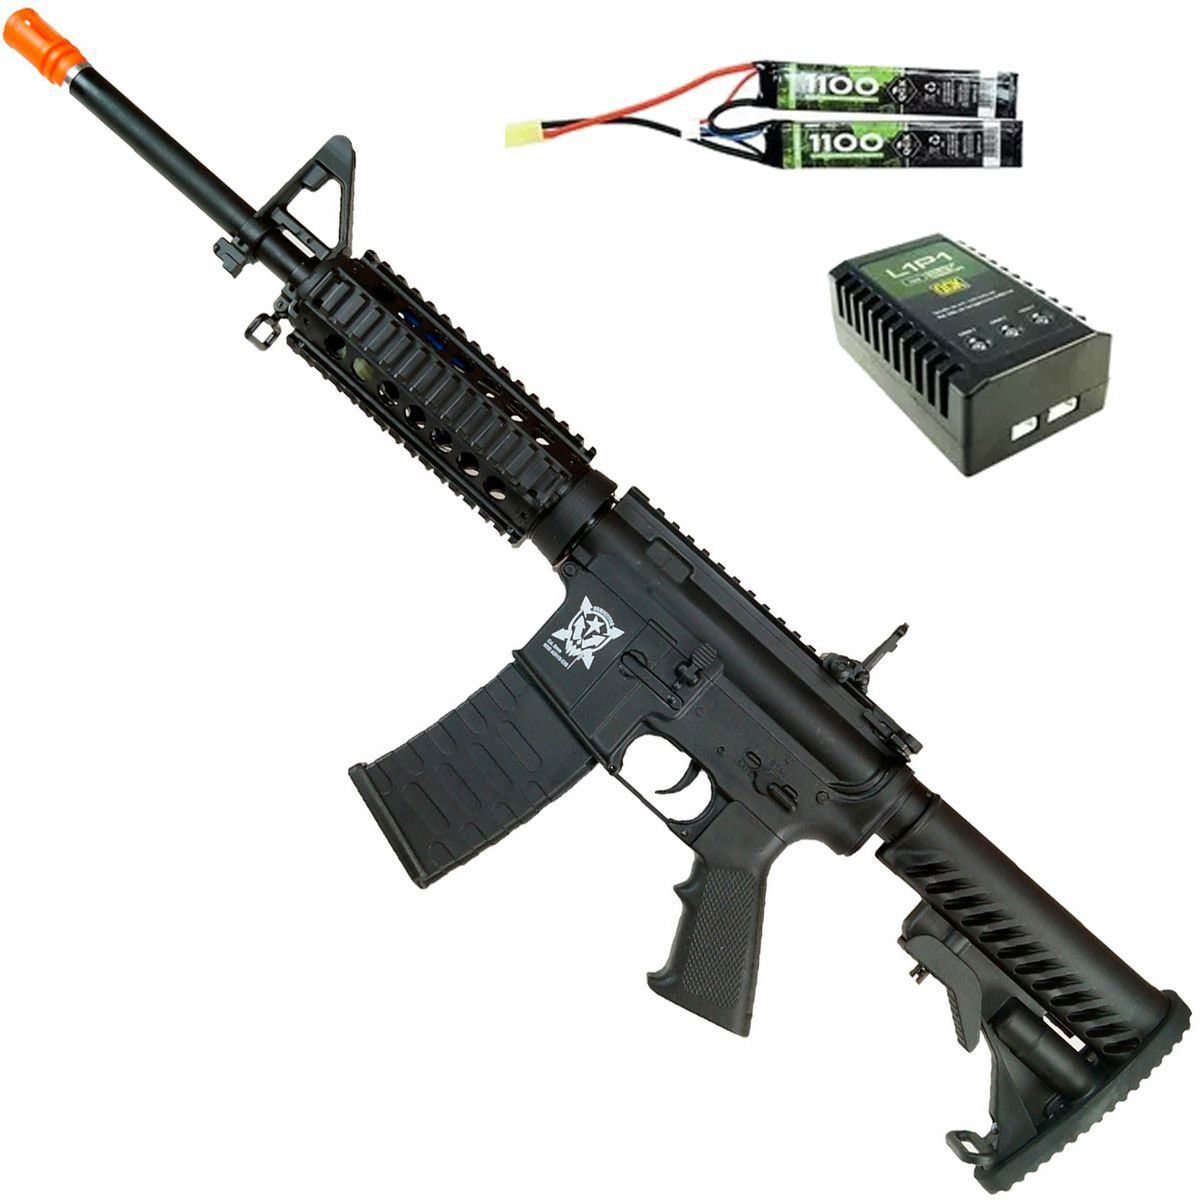 Rifle Airsoft APS M4 Kompetitor RIS Blowback Elétrico Bivolt 6mm